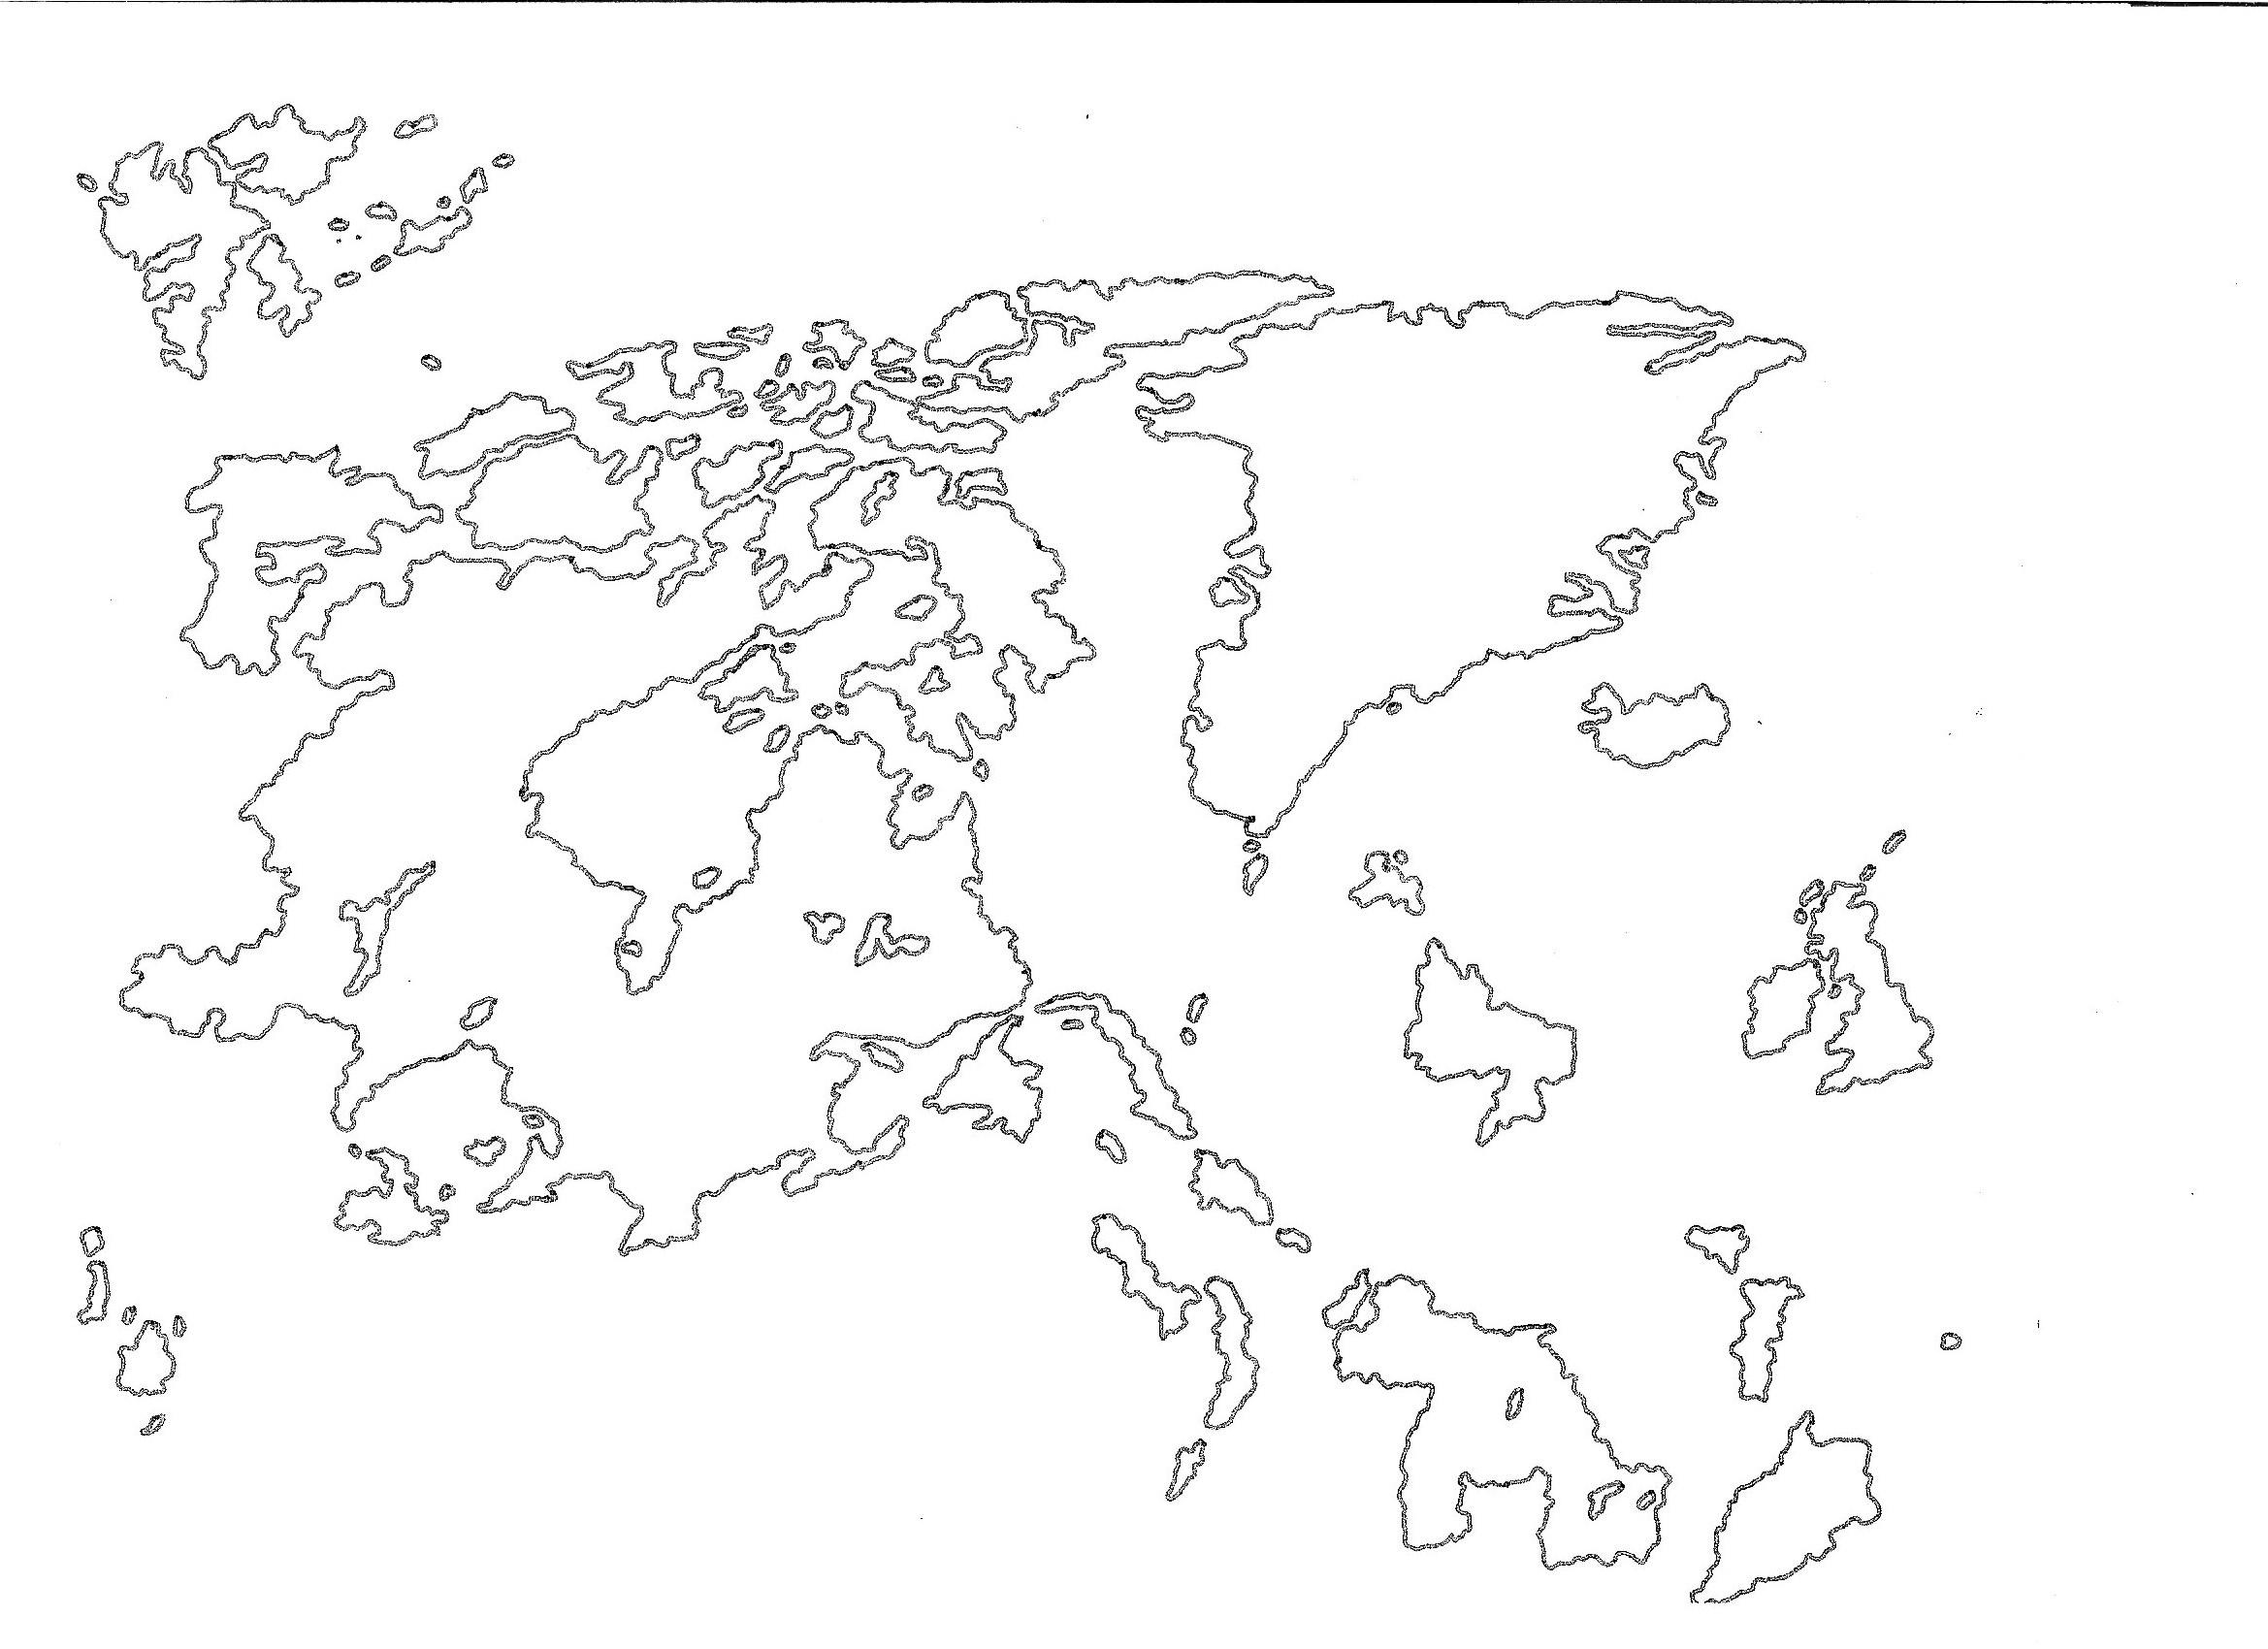 World Map Black And White Tumblr. Fantasy world map tumblr  photo 22 World Map Tumblr